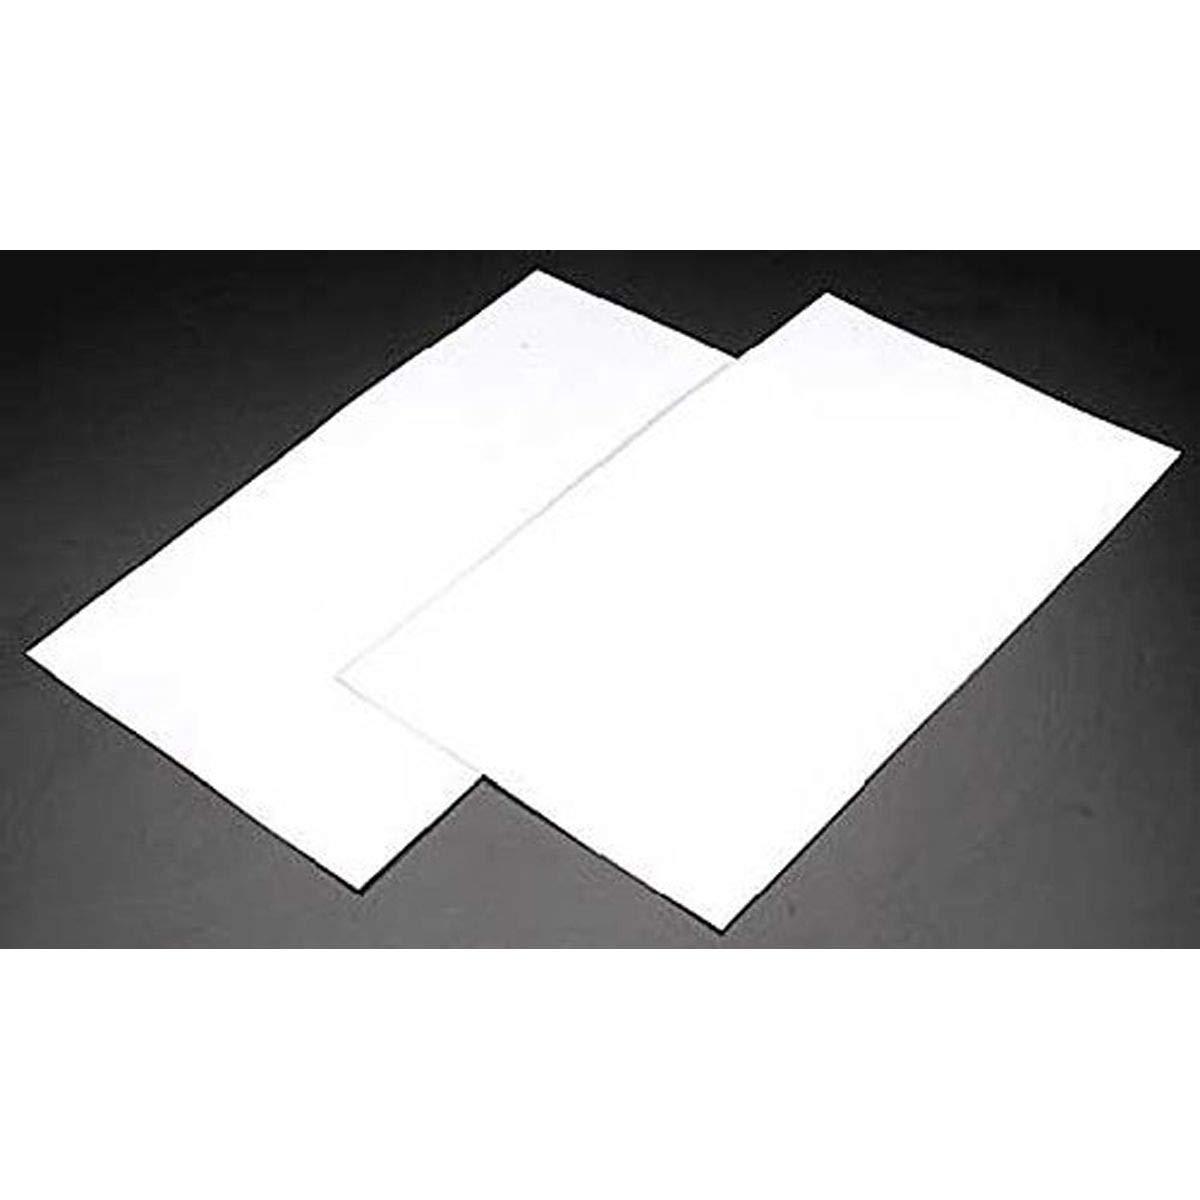 Plastruct PS-10 N Corrugated Sheets (2) PLS91510